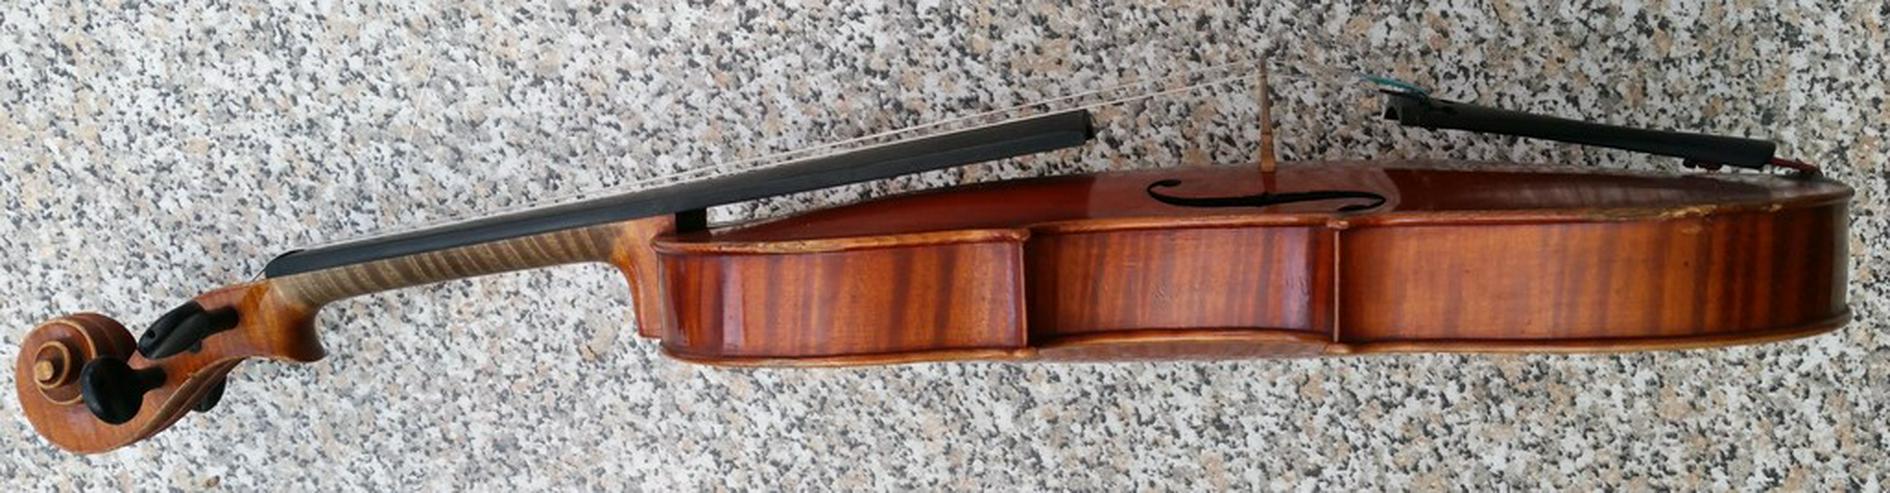 Bild 2: Alte Geige